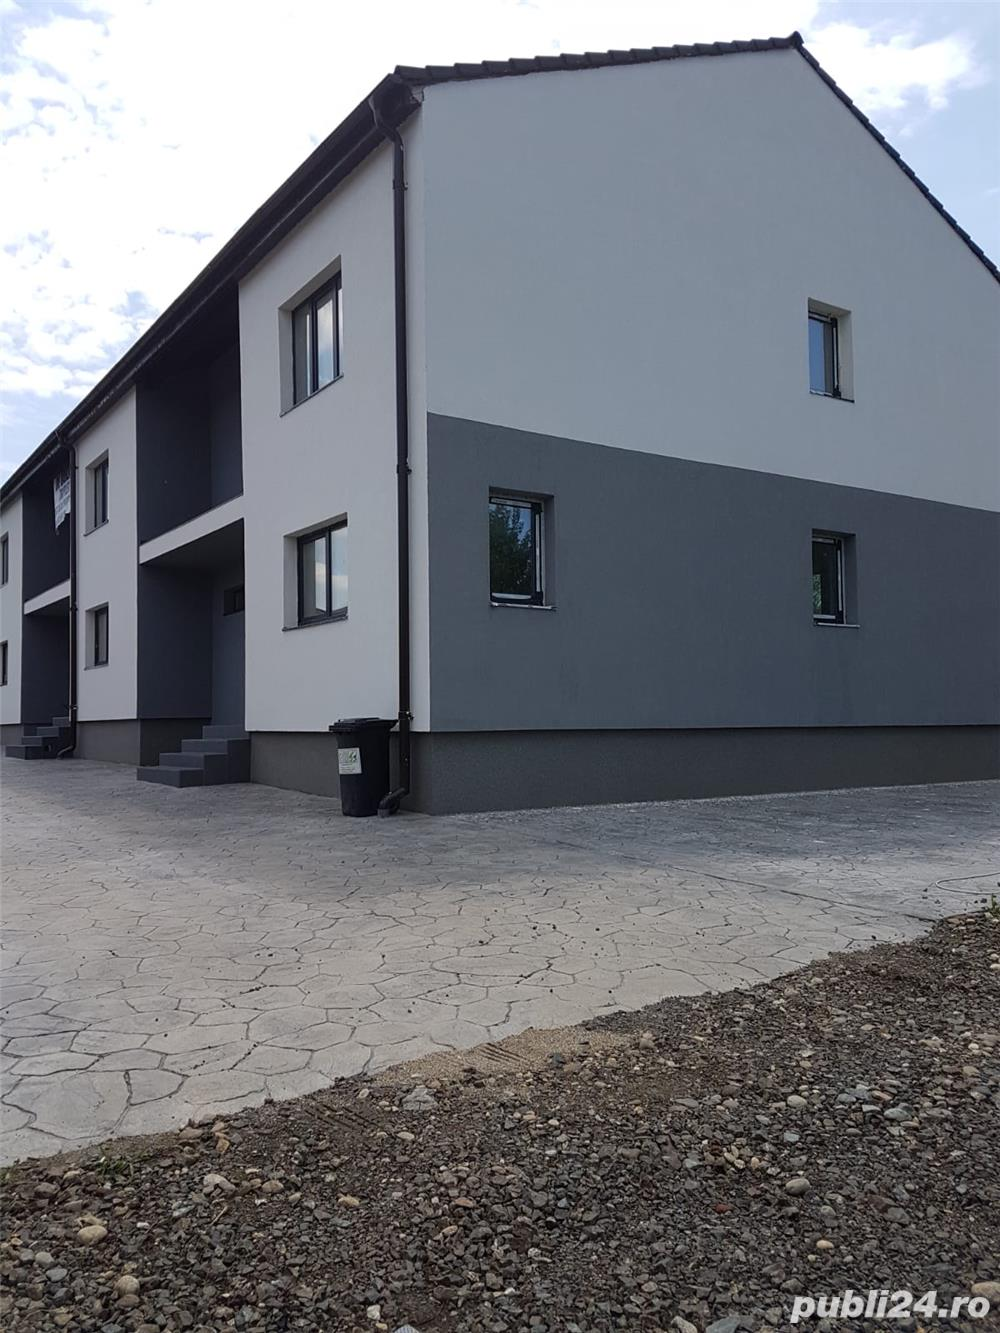 Dumbravita, zona Lidl, casa p+e, tip triplex, 120mp. Util, 3 terase, gaz,c.e.apa, canal  teren200mp